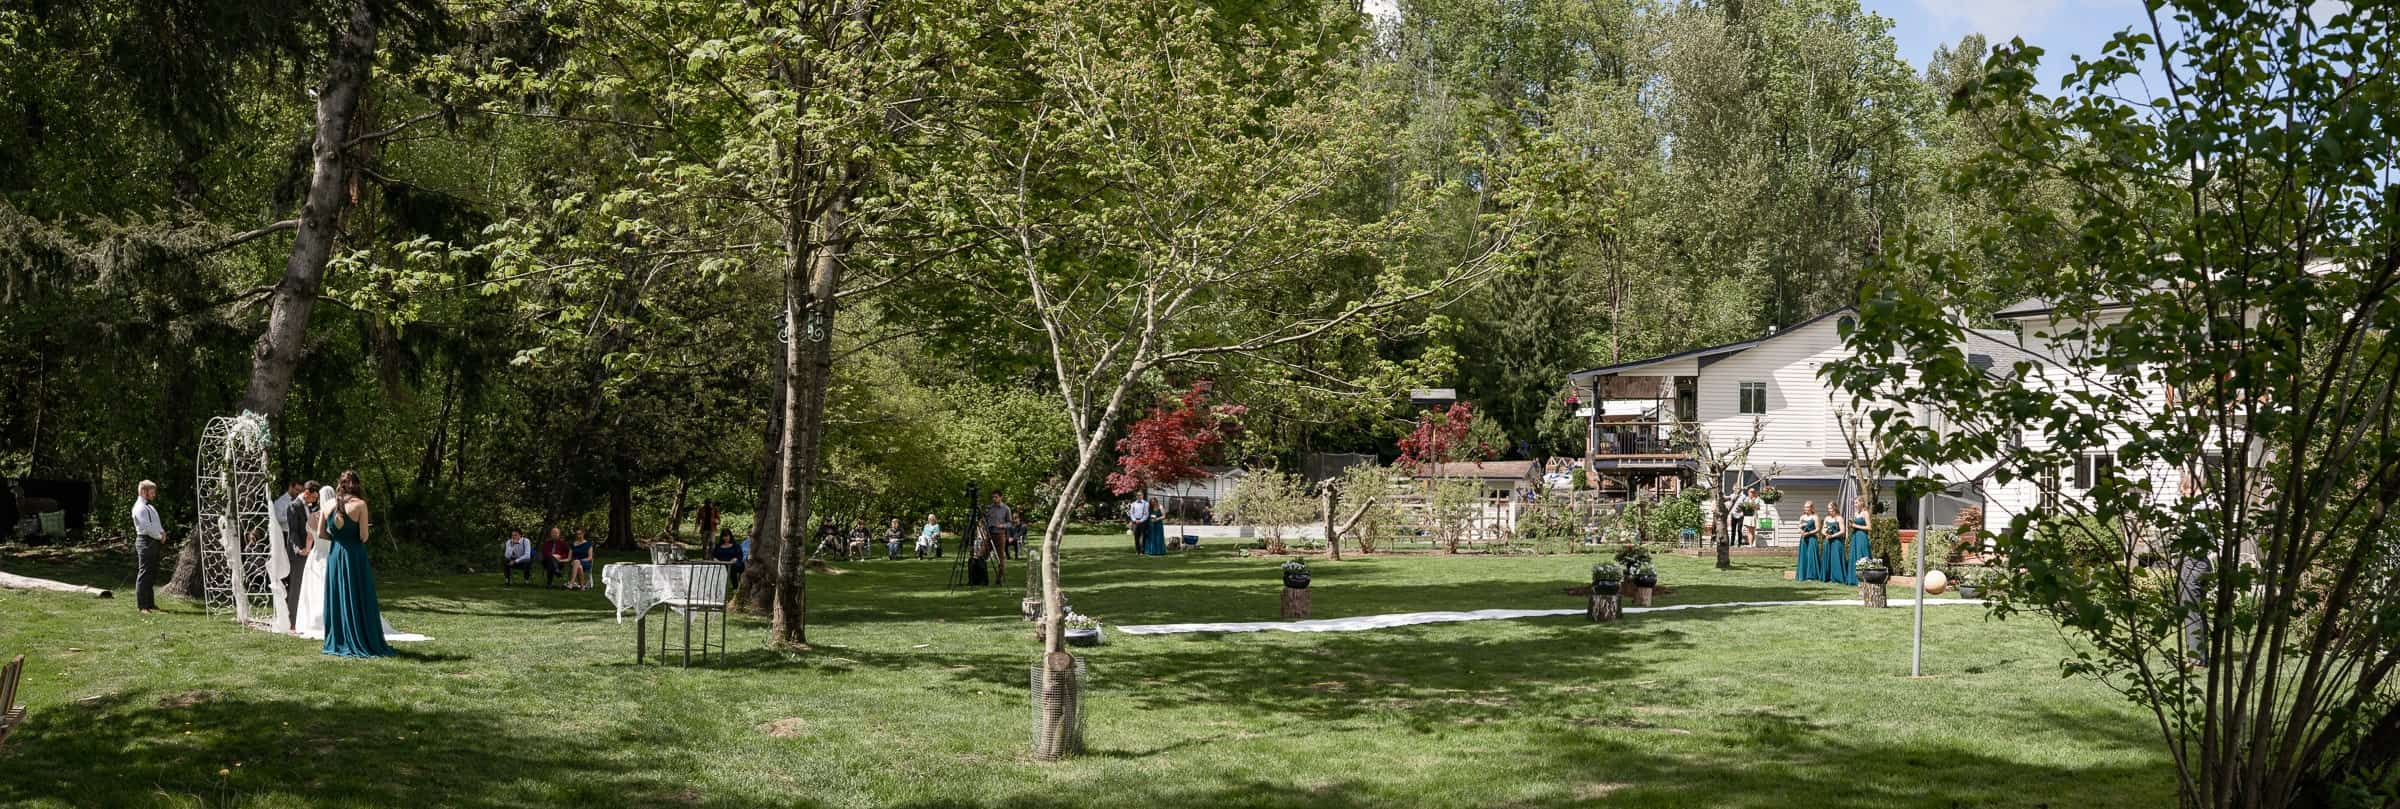 panorama of backyard socially distanced covid wedding